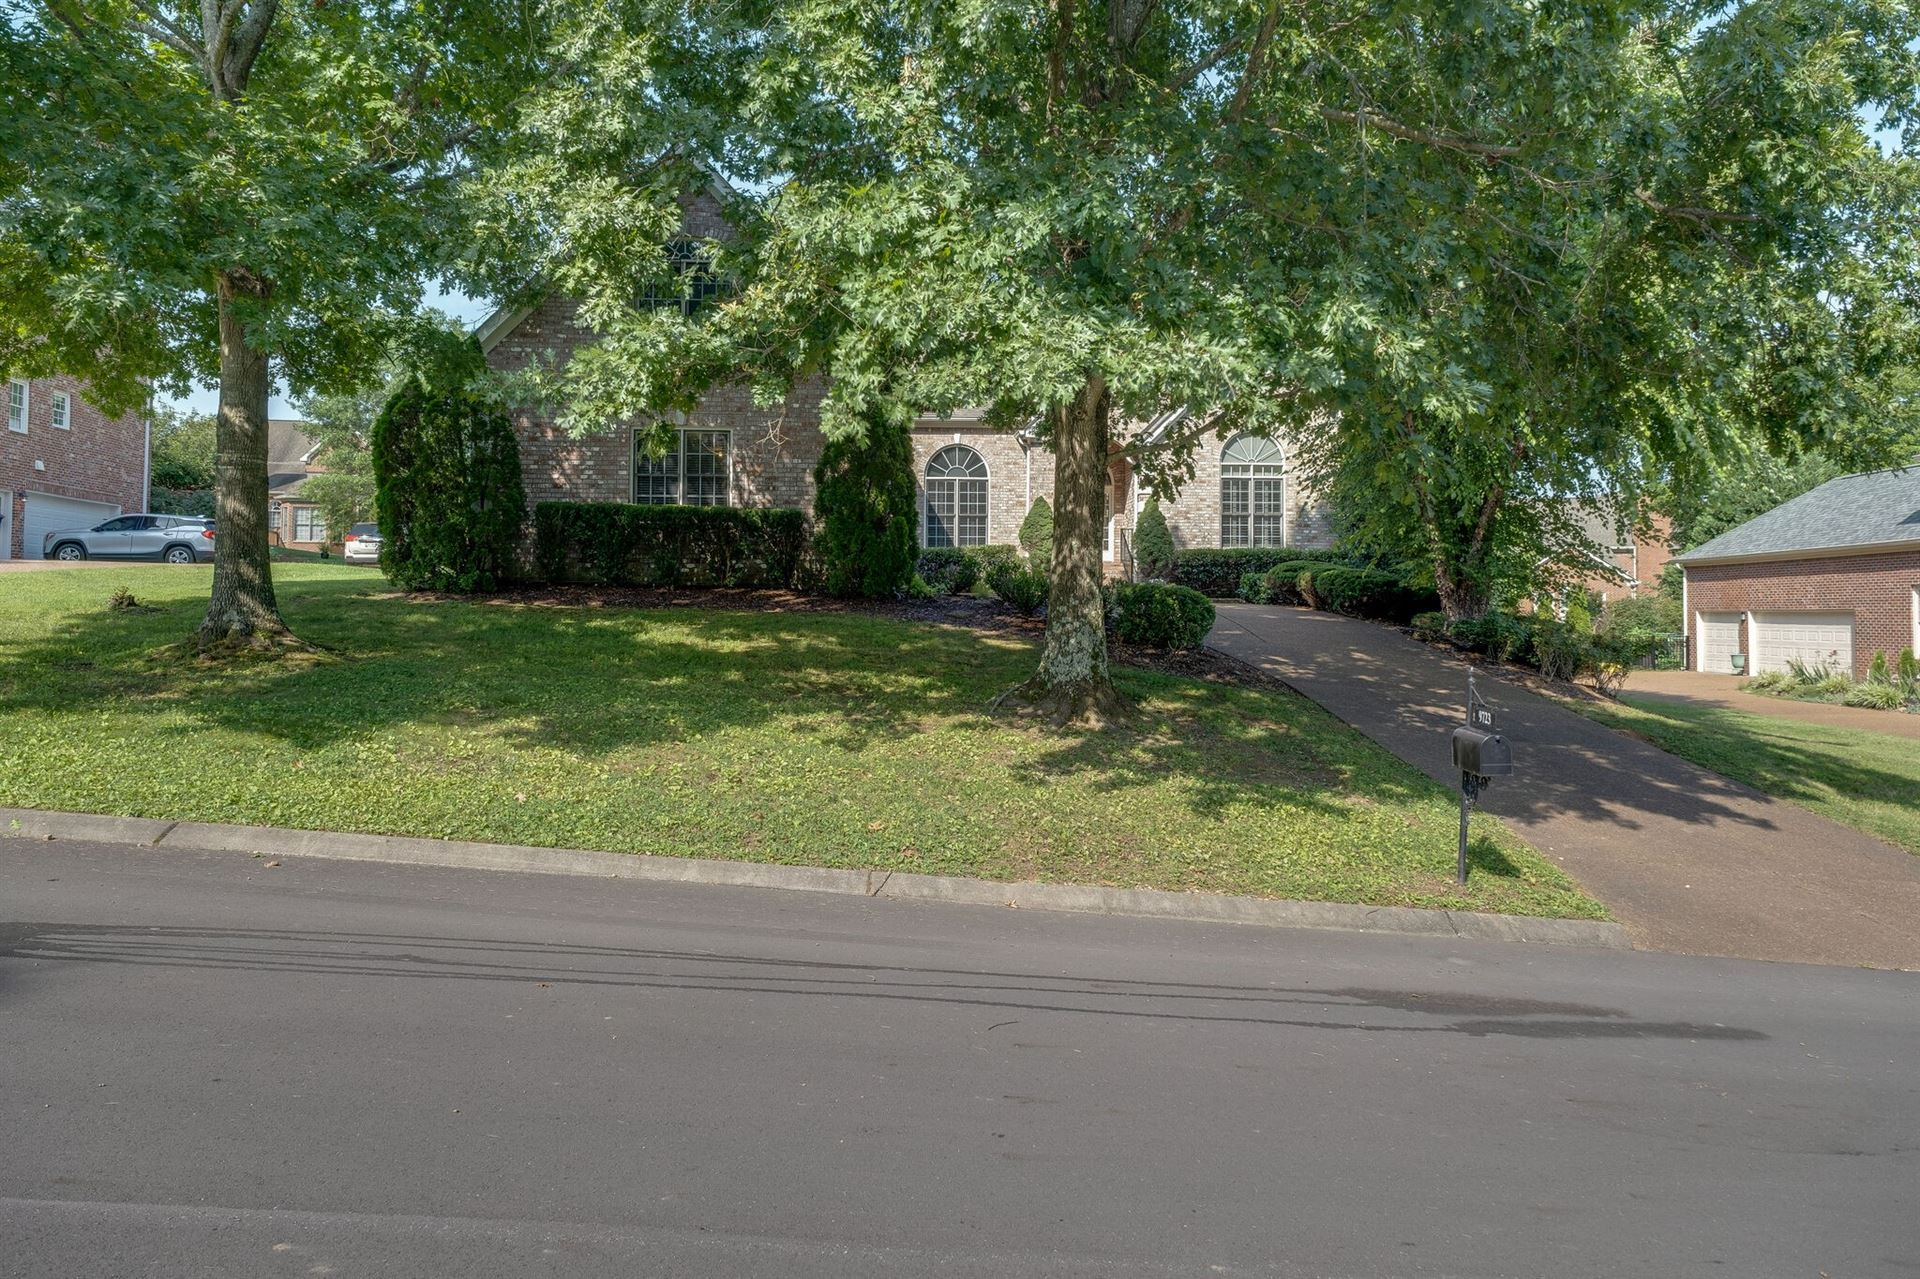 Photo of 9723 Turnbridge Ct, Brentwood, TN 37027 (MLS # 2273948)